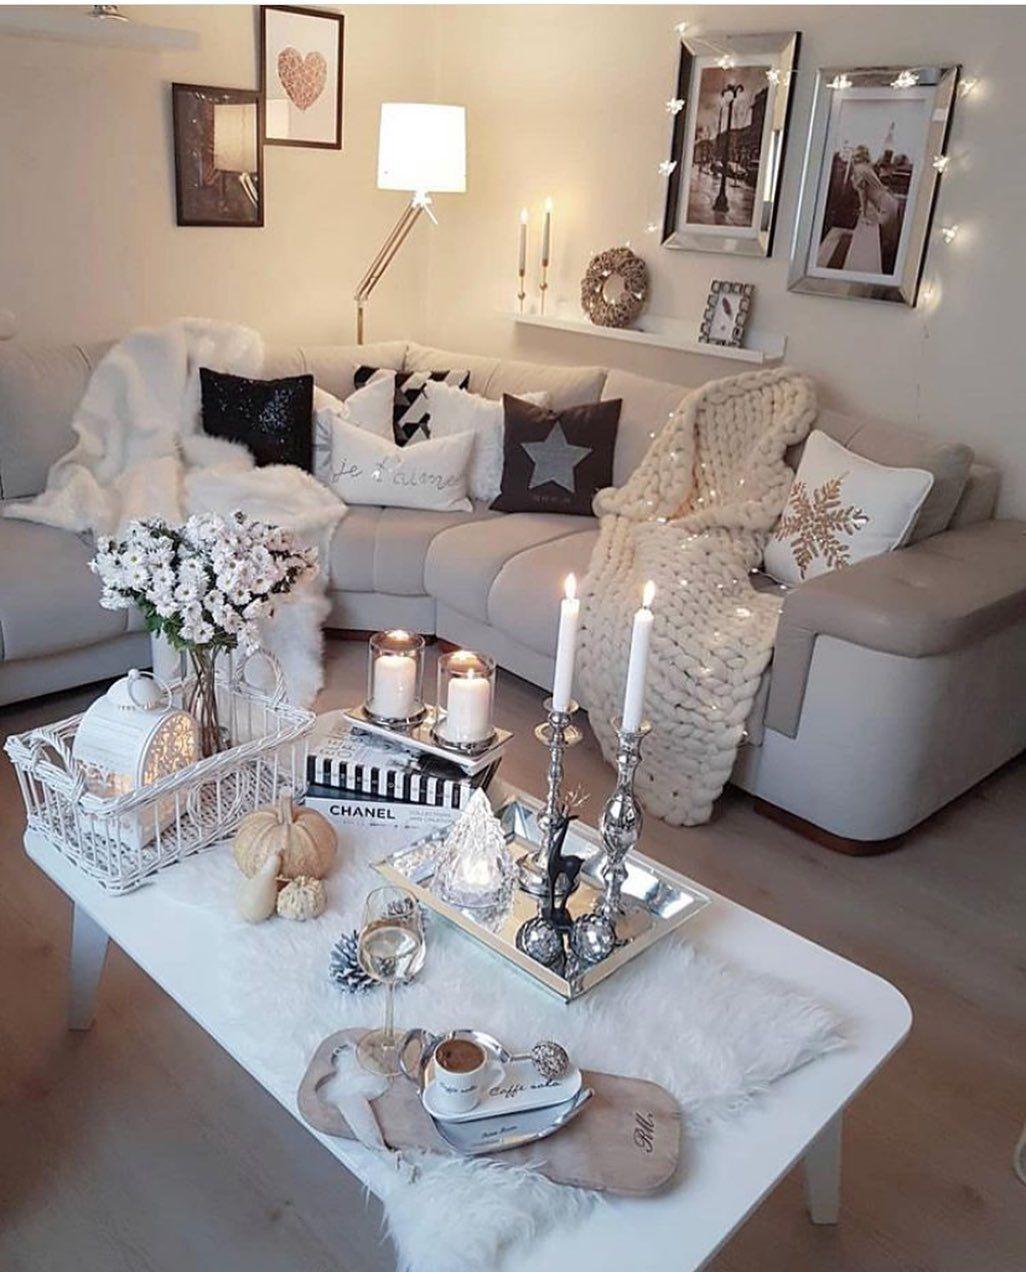 Home Design Ideas Instagram: INTERIORS HOME DECOR IDEAS On Instagram : Living Room